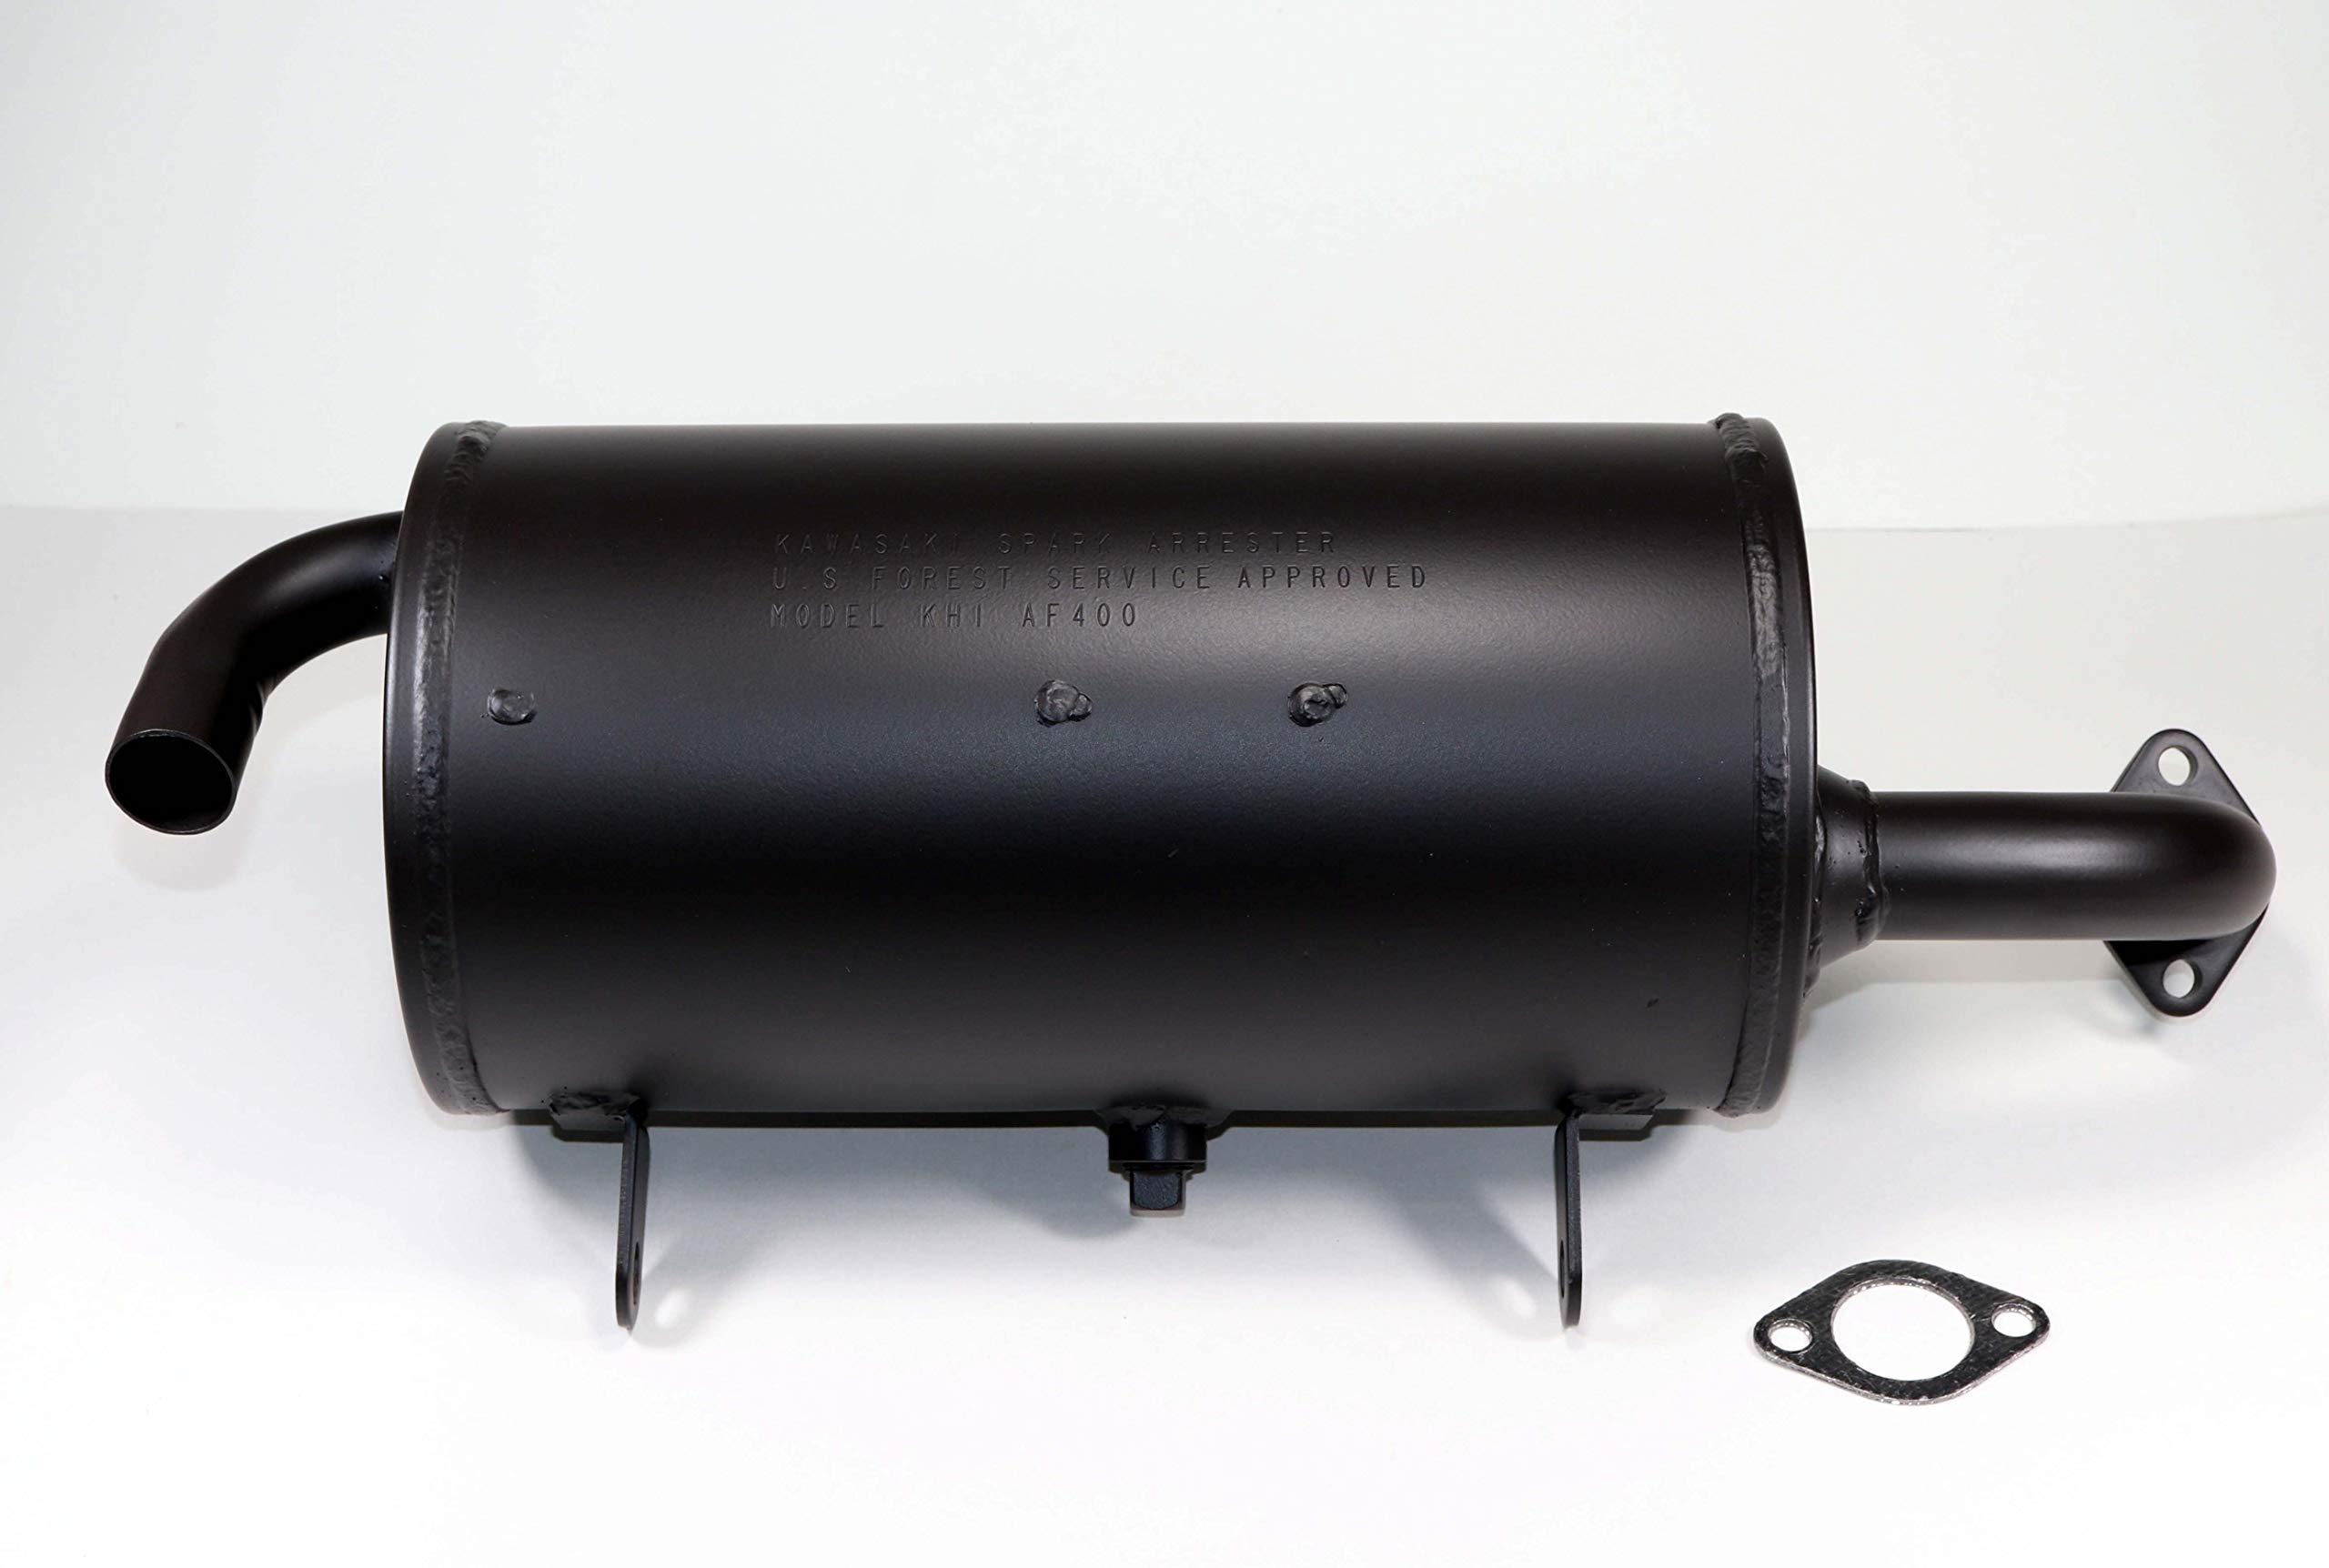 Kawasaki Mule 600/610 NEW Exhaust/Muffler - Replaces 18091-0235 w/Gasket by ATVWorks